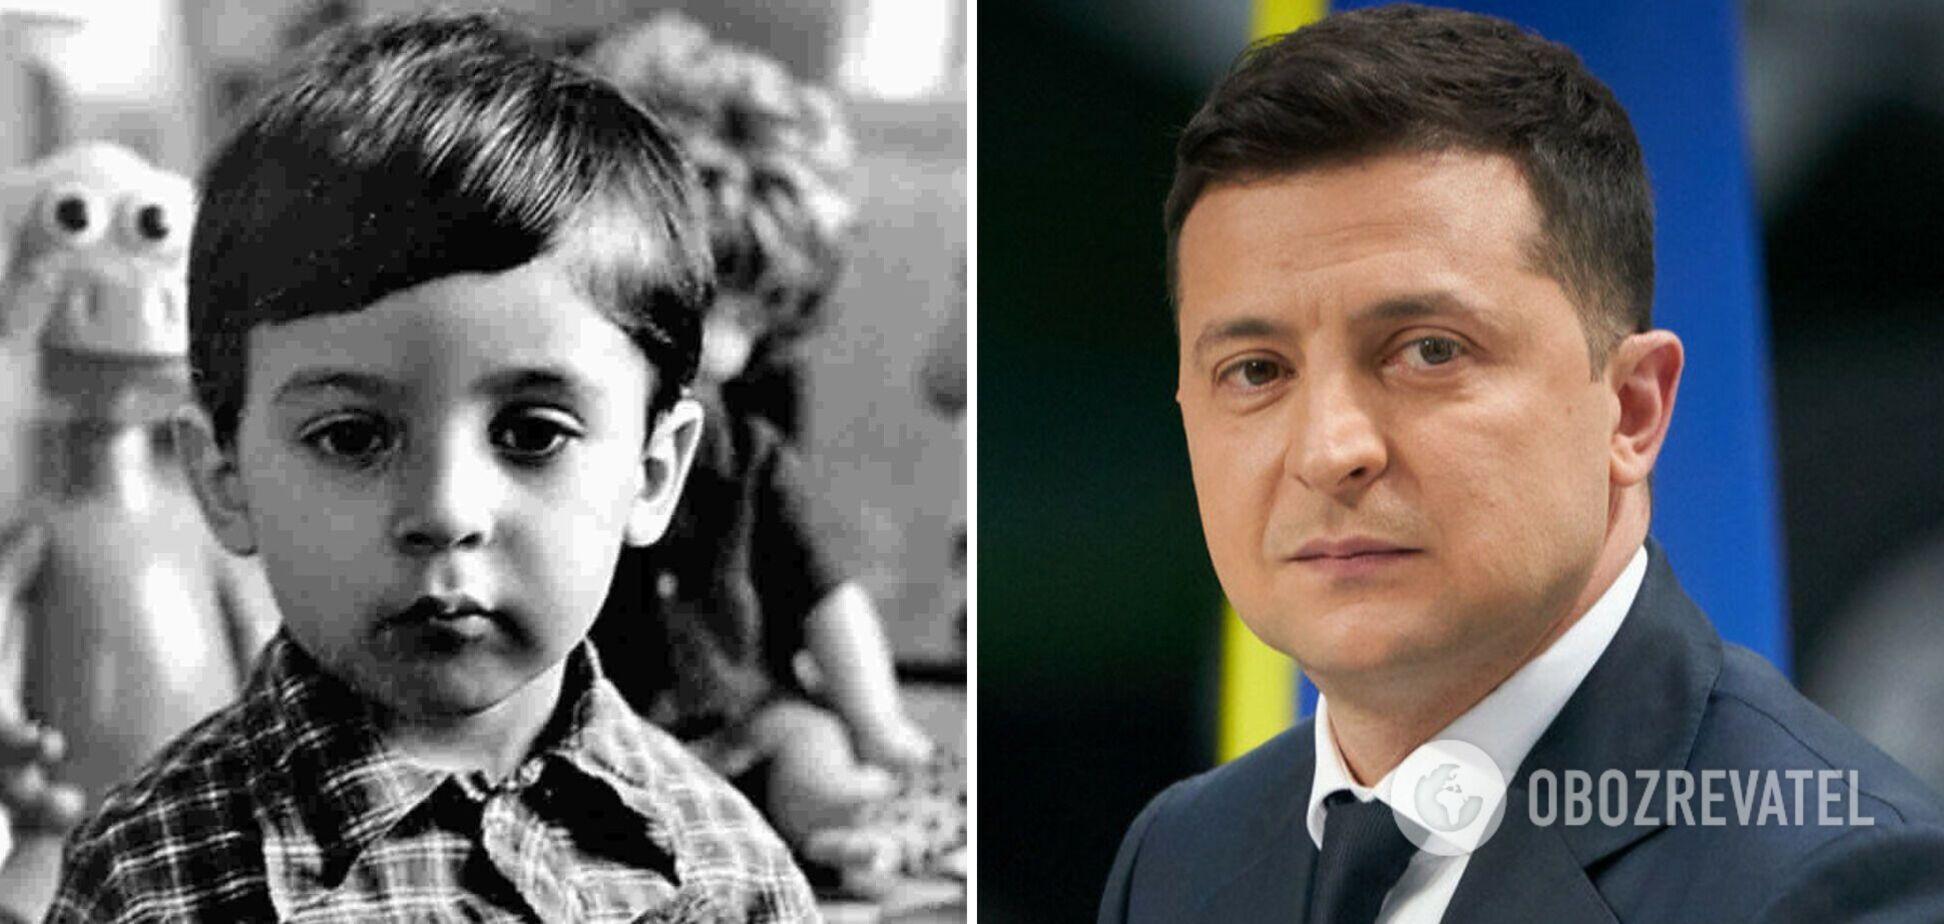 Как менялся Зеленский: фото президента на протяжении карьеры